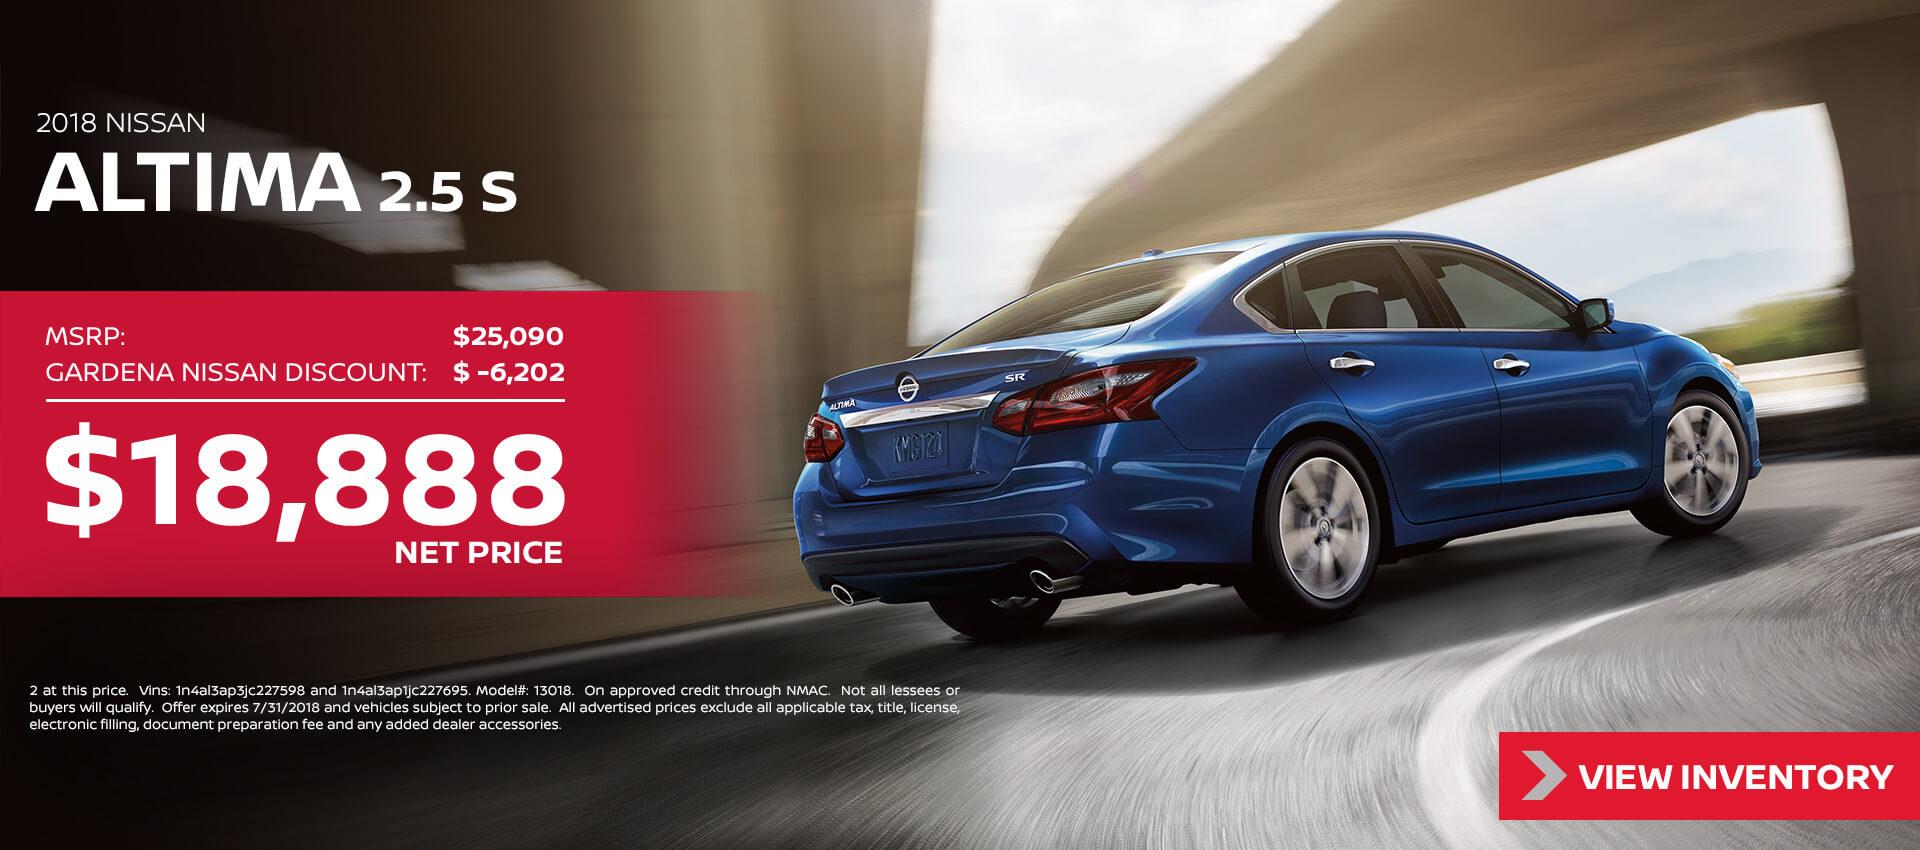 2018 Nissan Altima $18,888